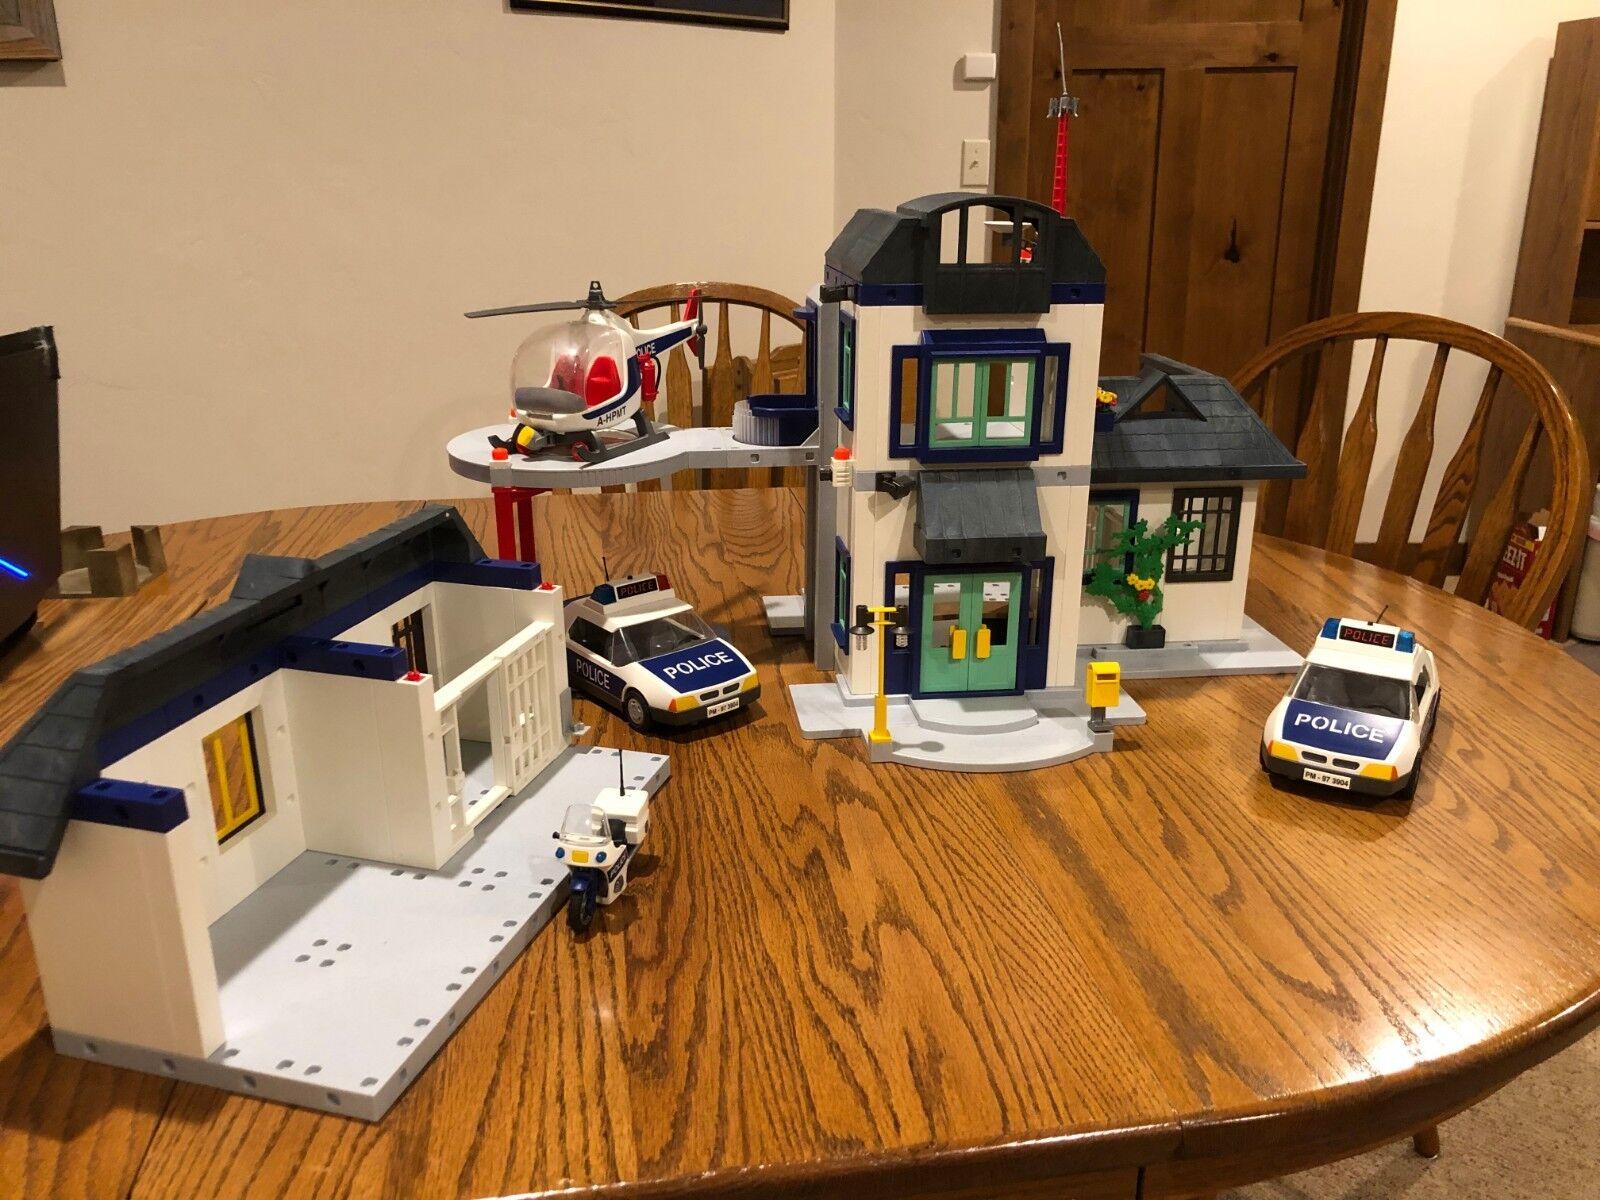 Police station Playmobil Bundle 3988, 3085,3908, 3904, 3957, 3915